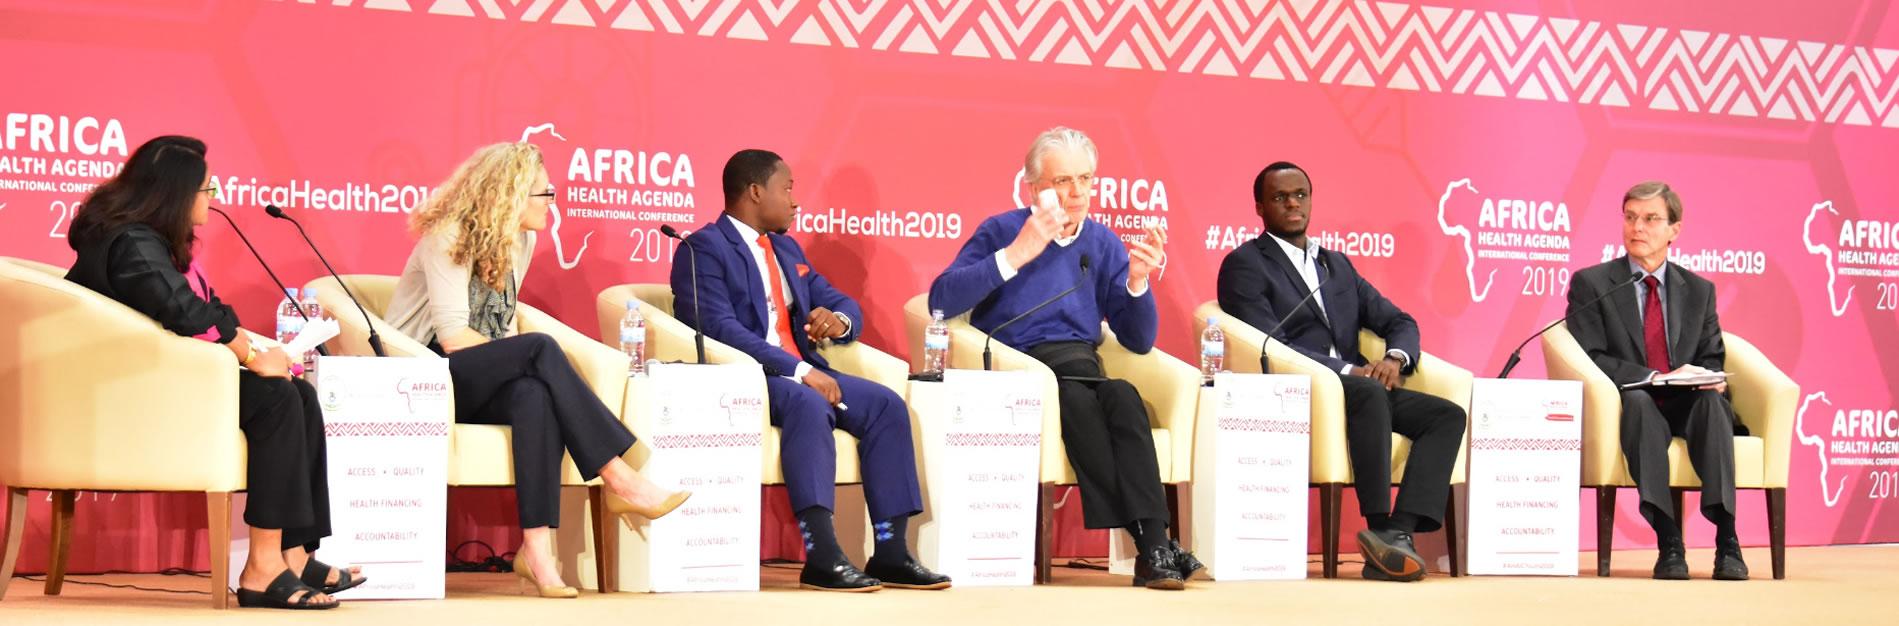 Africa Health 2019 Conference in Kigali, Rwanda